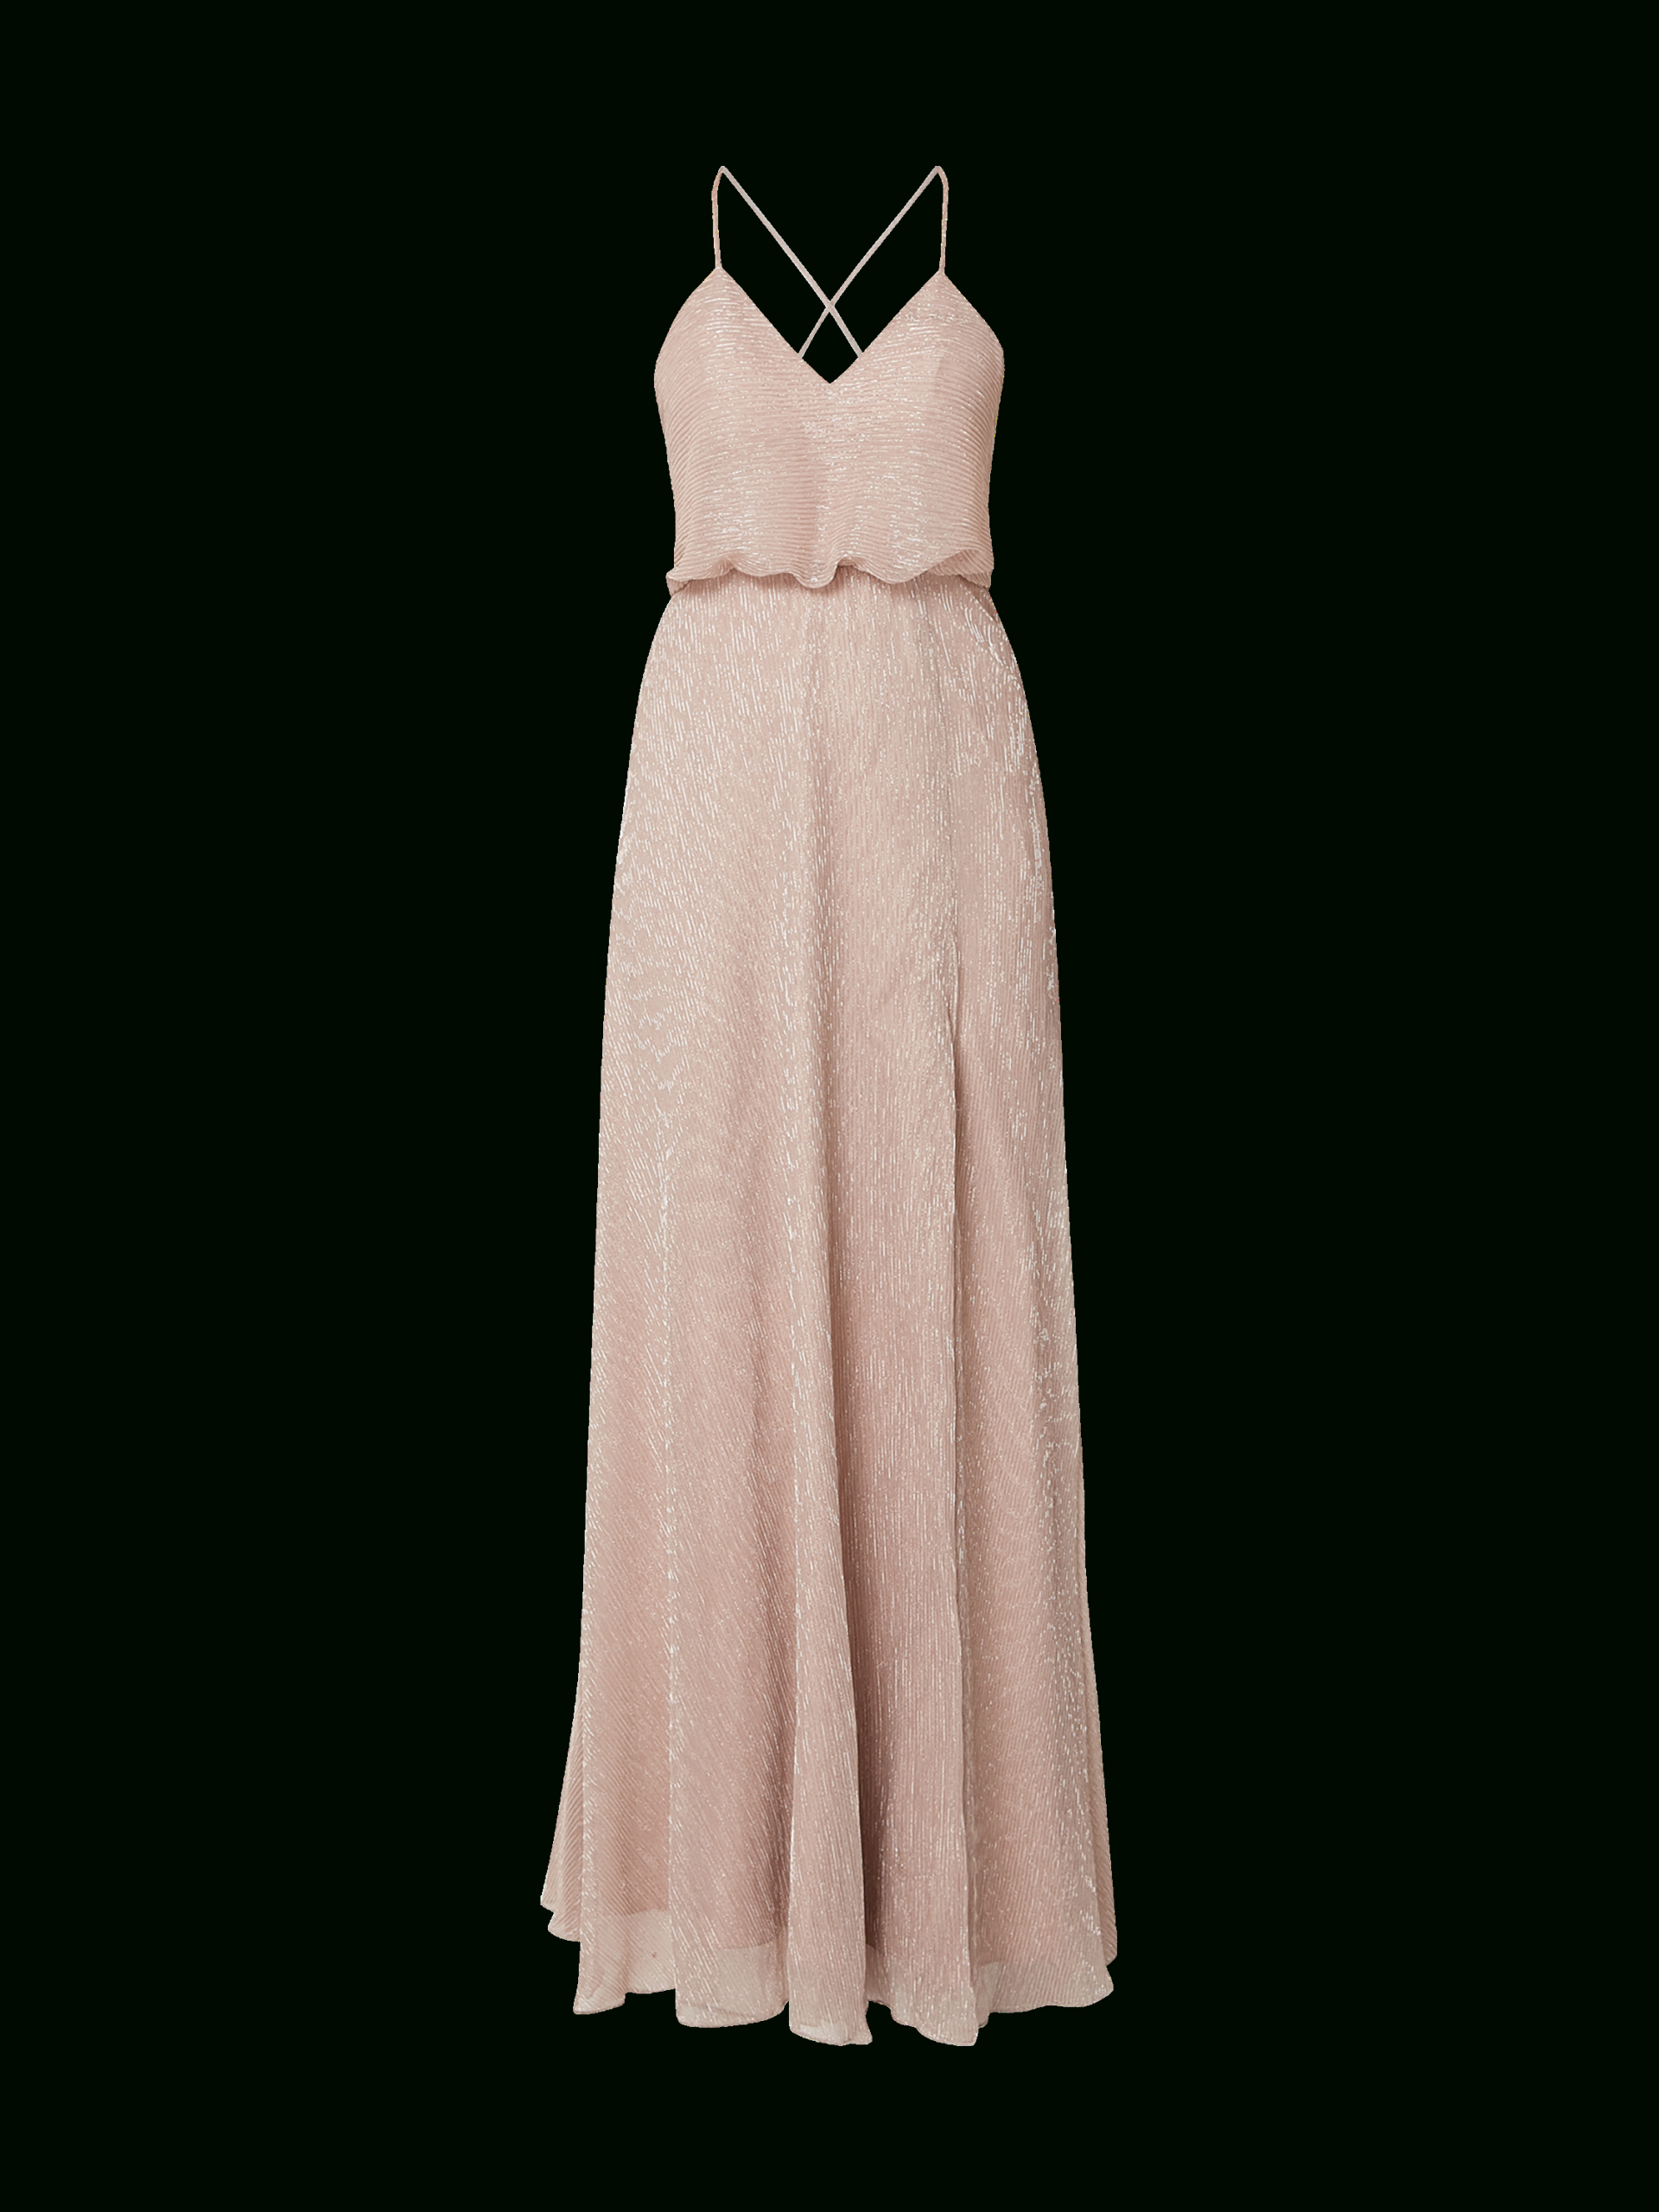 15 Coolste Peek Cloppenburg Abendkleider SpezialgebietFormal Erstaunlich Peek Cloppenburg Abendkleider Ärmel